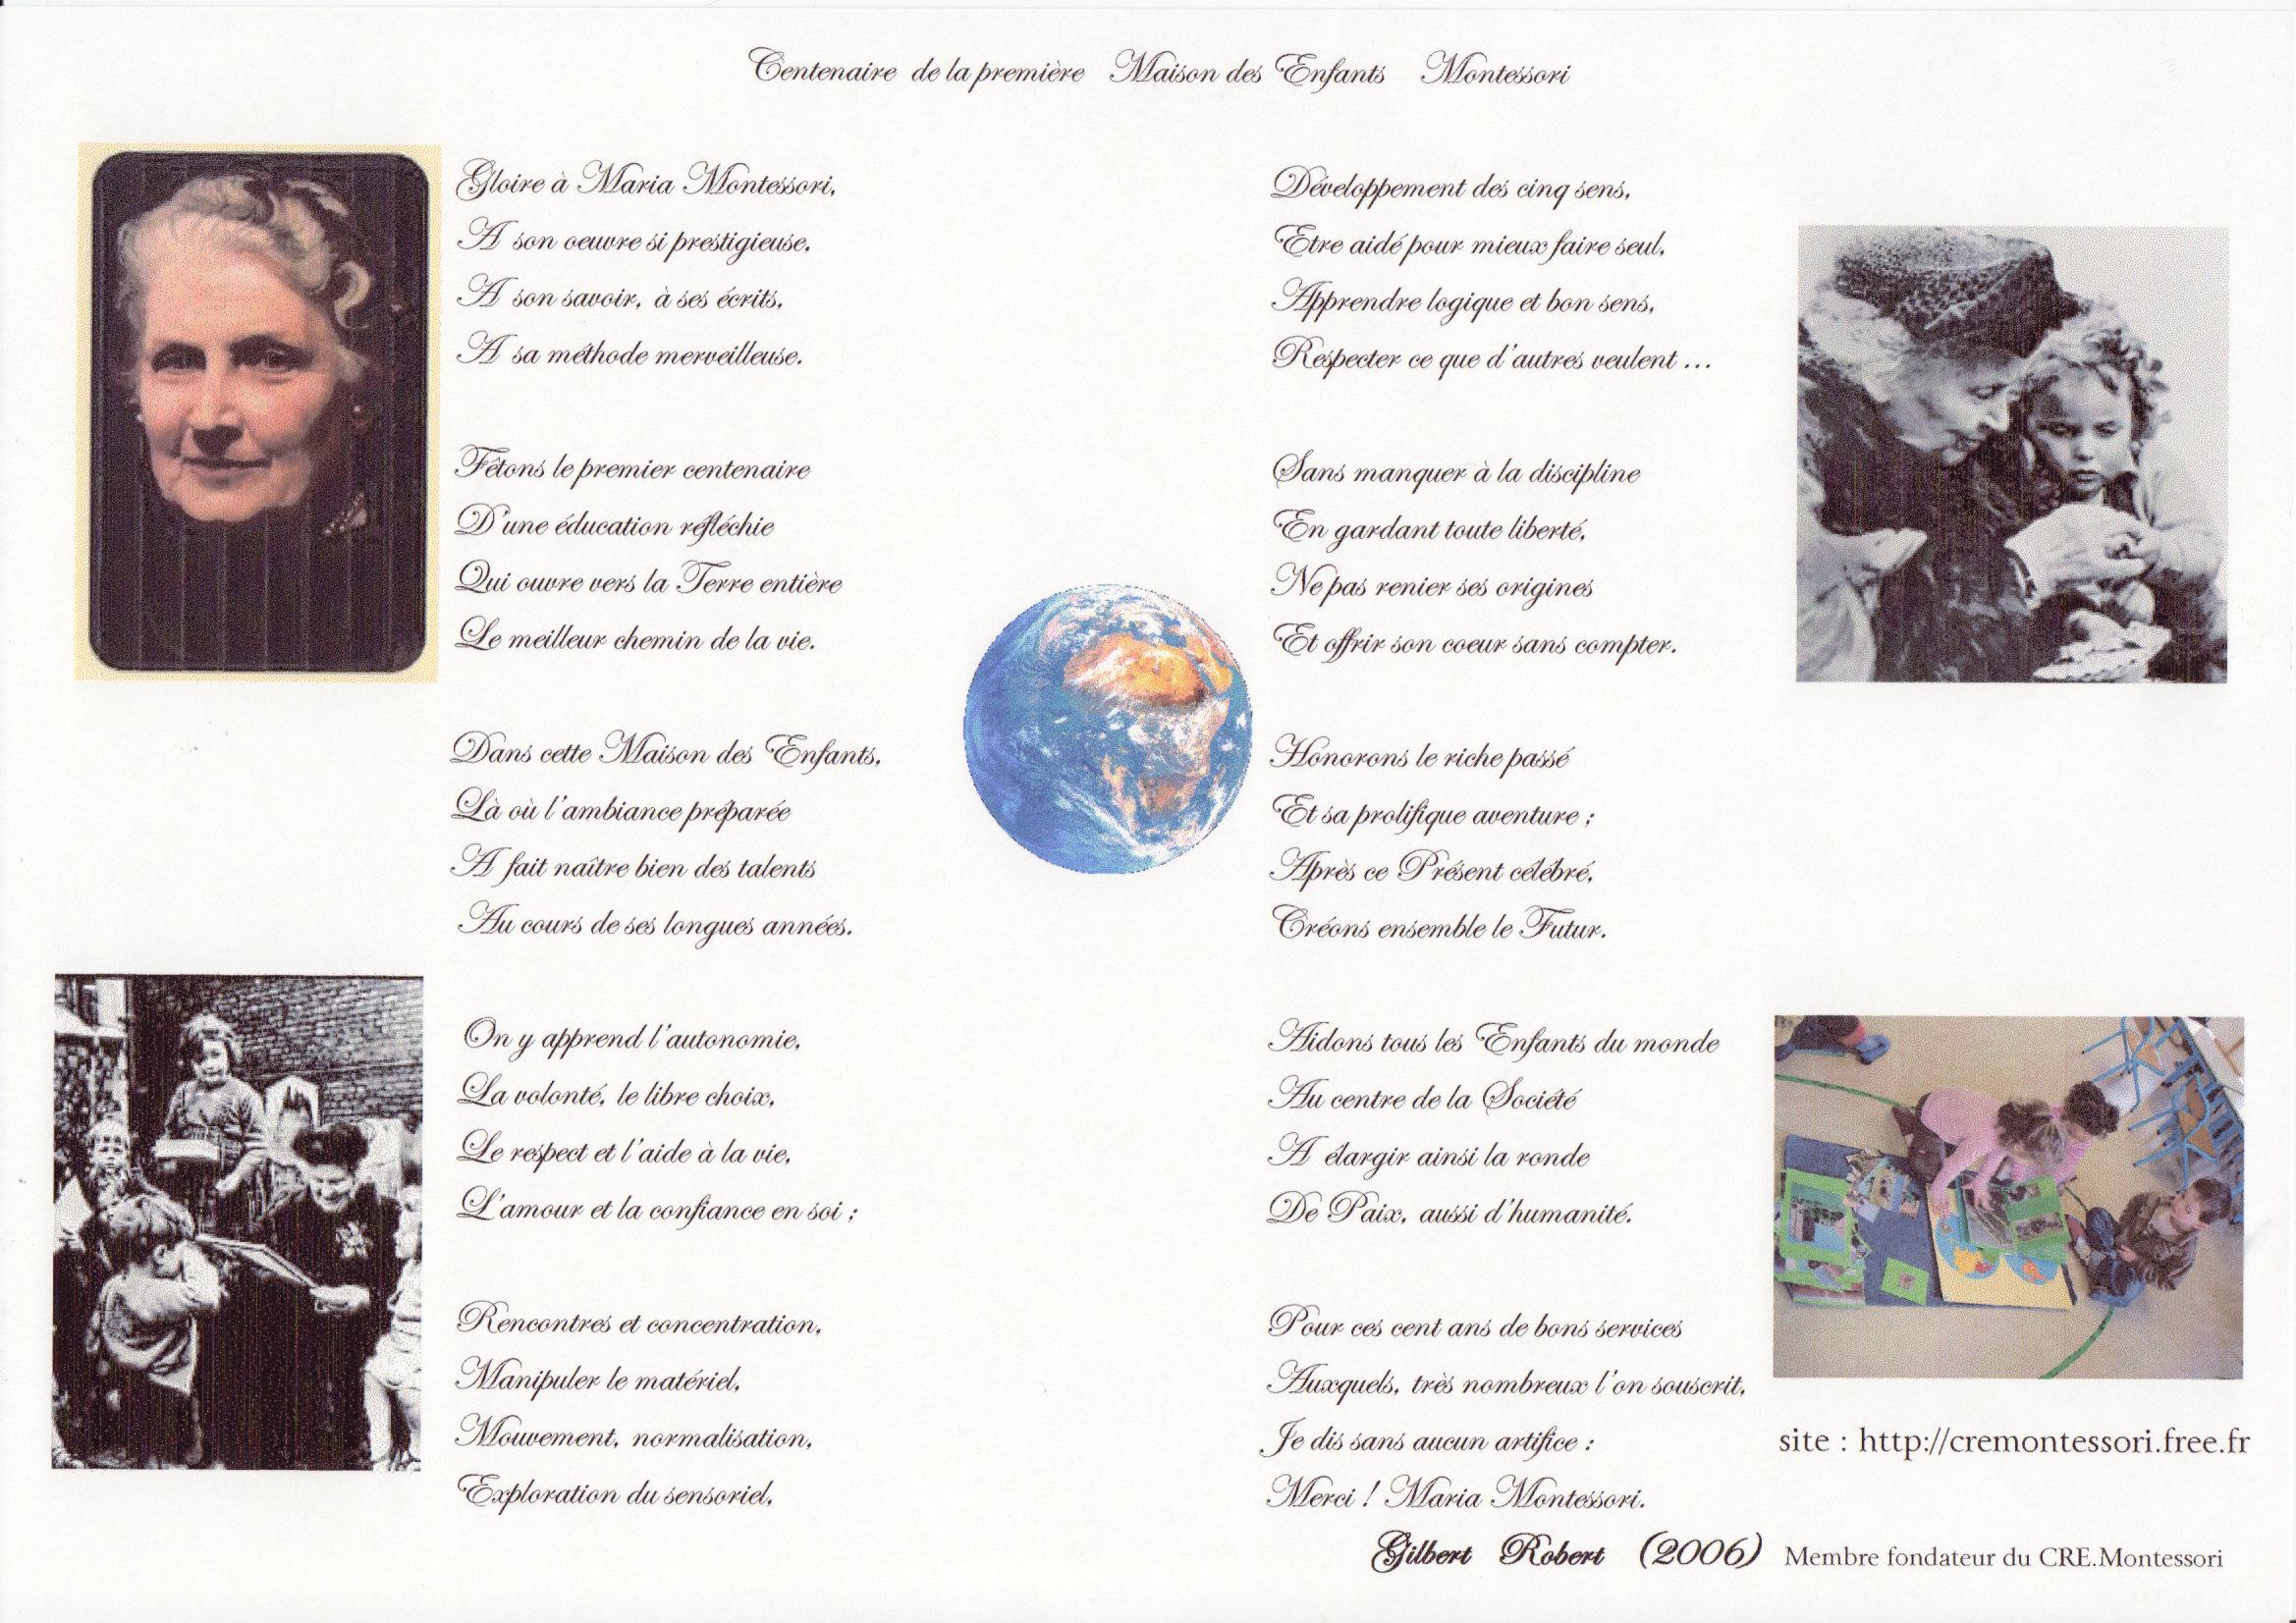 pome maria montessori loccasion du centenaire de la premire maison des enfants gilbert robert 2006 - Maria Montessori Lebenslauf